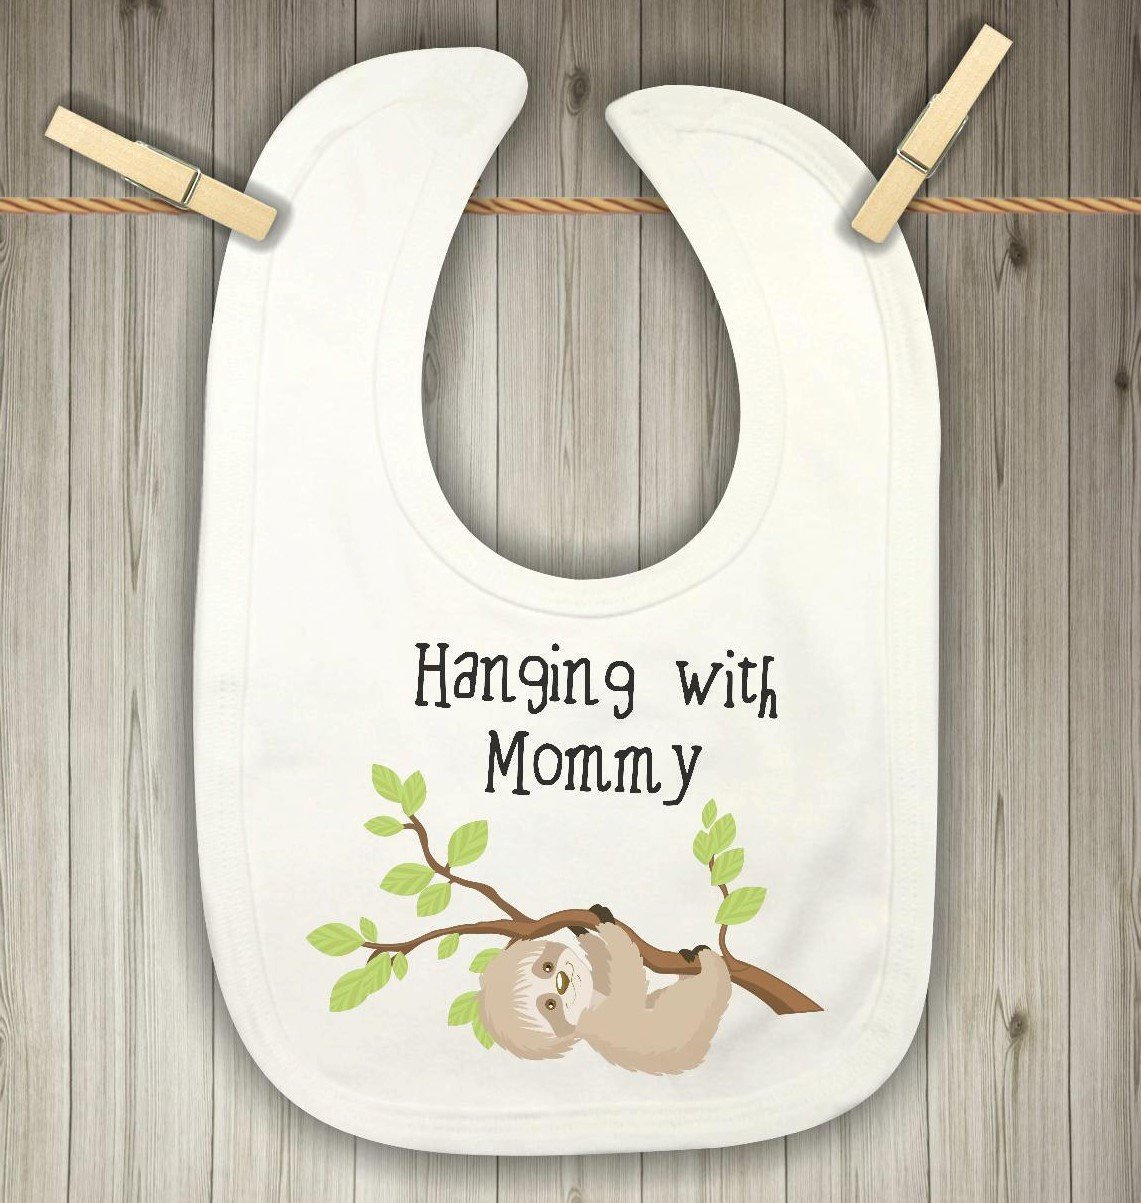 Baby Bib - Sloth Hanging with Mommy - Zoo Nursery Decor